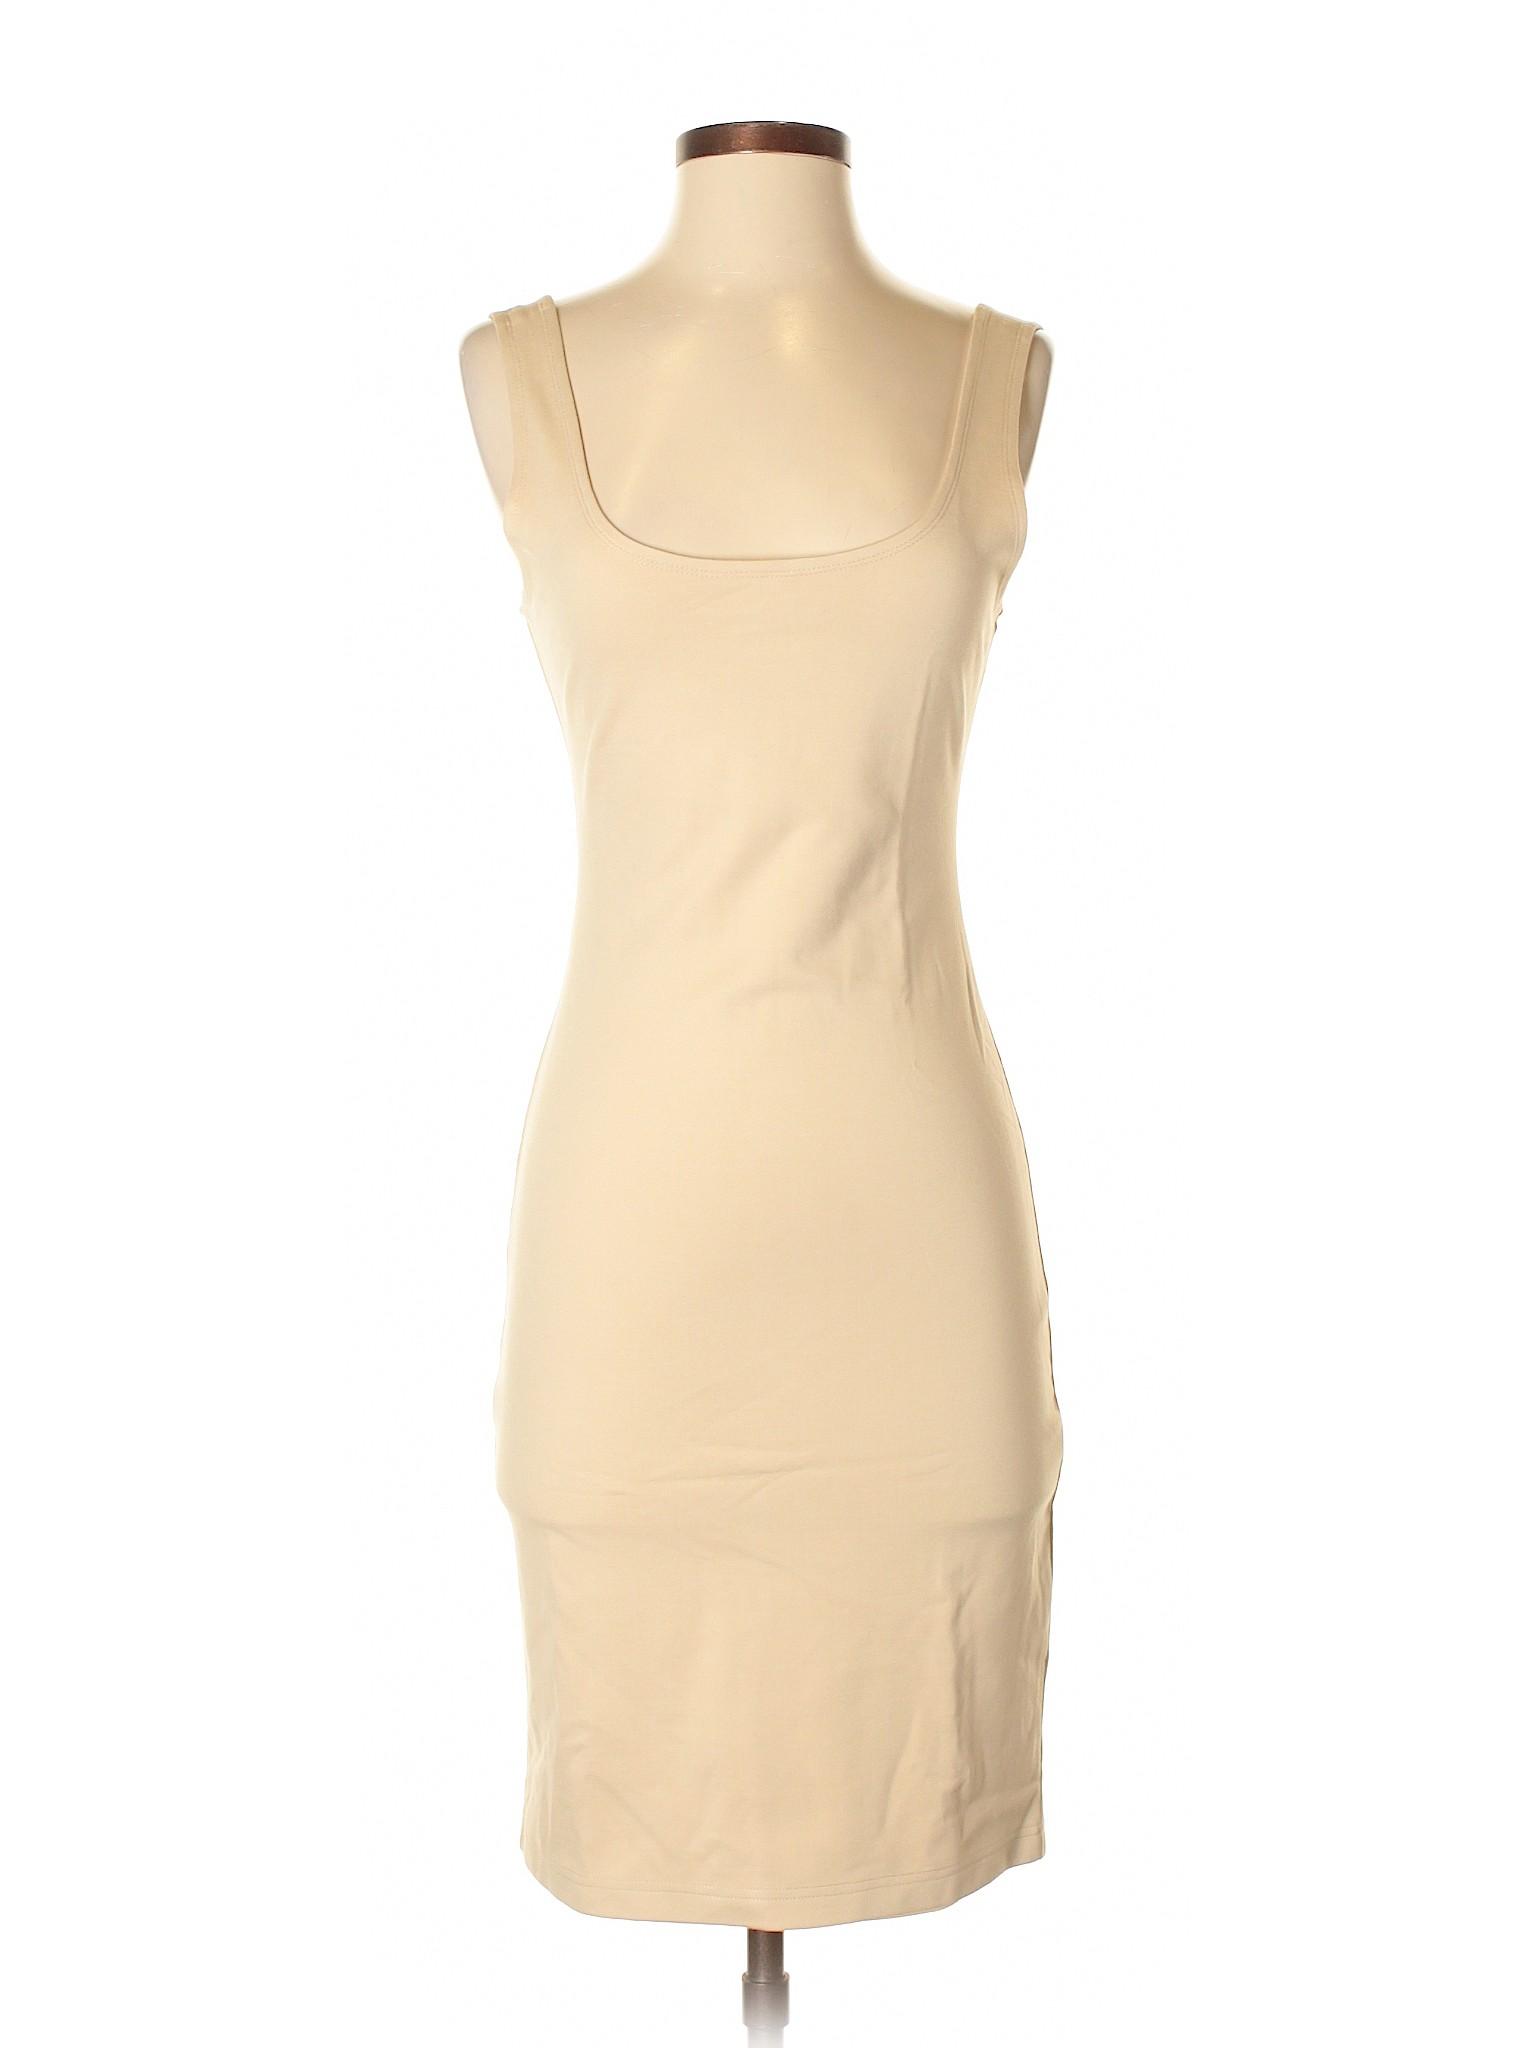 Selling Label Blaque Casual Label Casual Dress Selling Label Blaque Casual Dress Selling Blaque da1waqvx